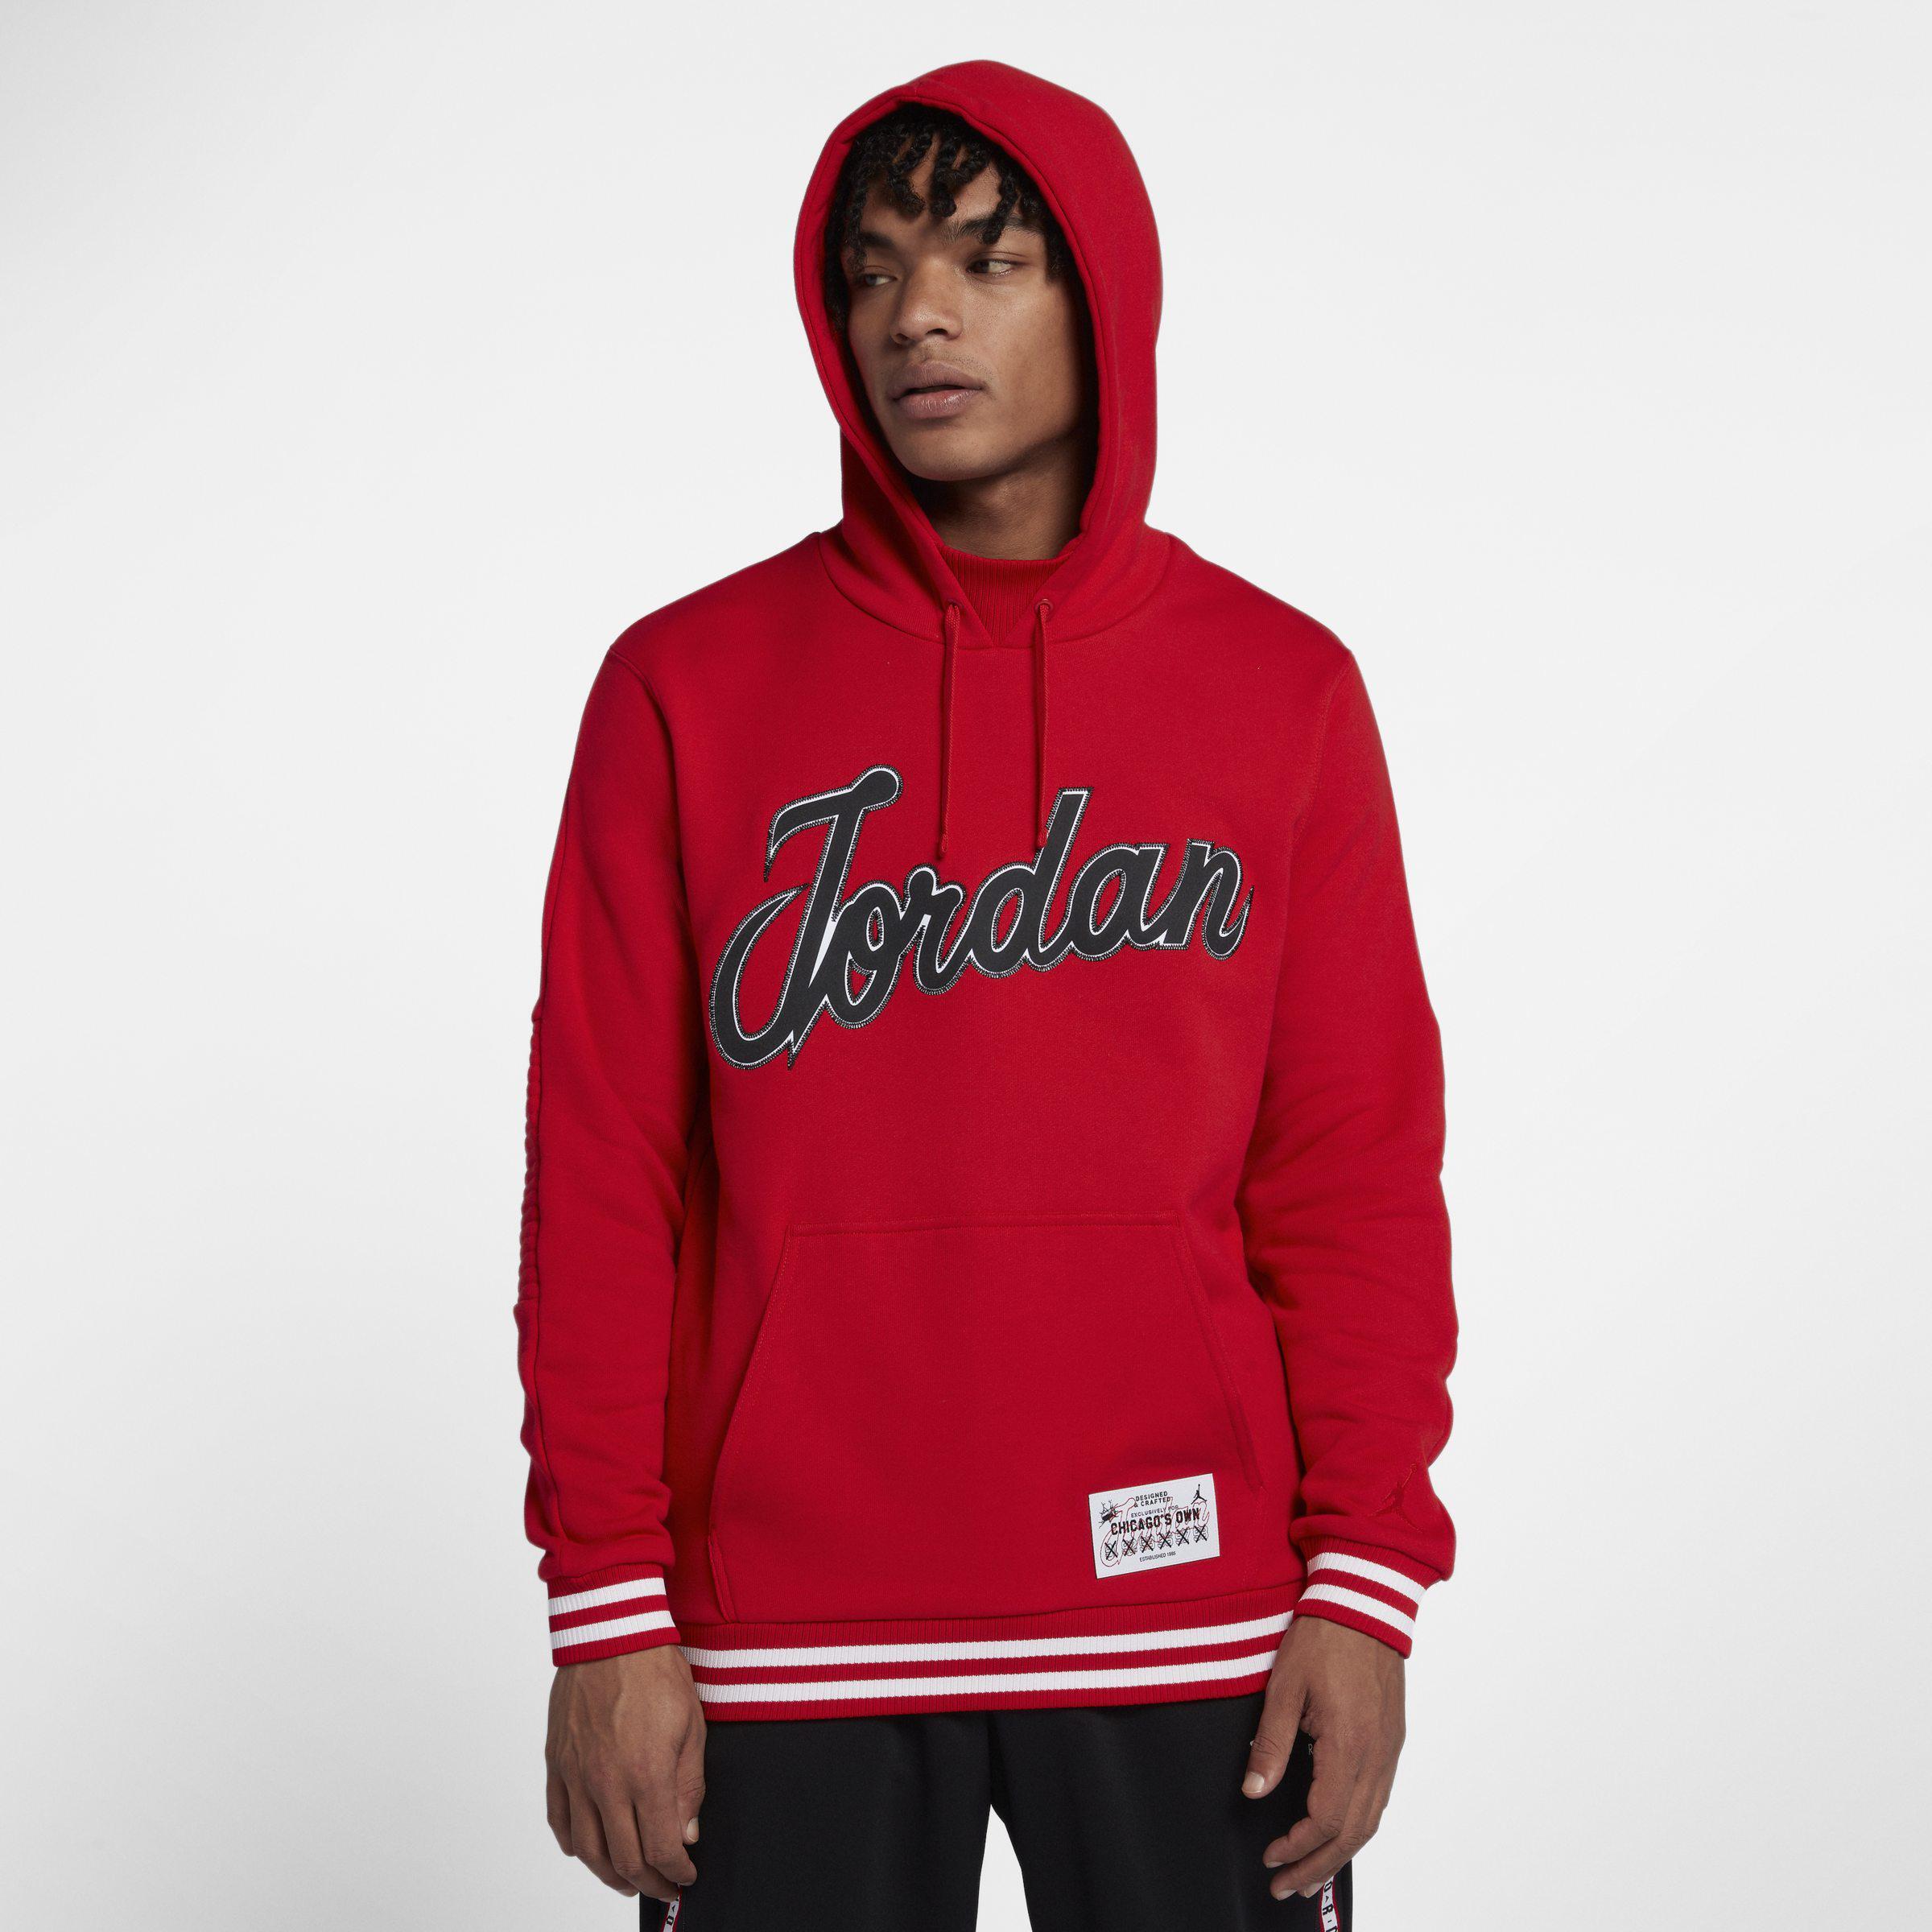 cbc8cbb5ce66 Nike Jordan Sportswear Hockey Pullover Hoodie in Red for Men - Lyst